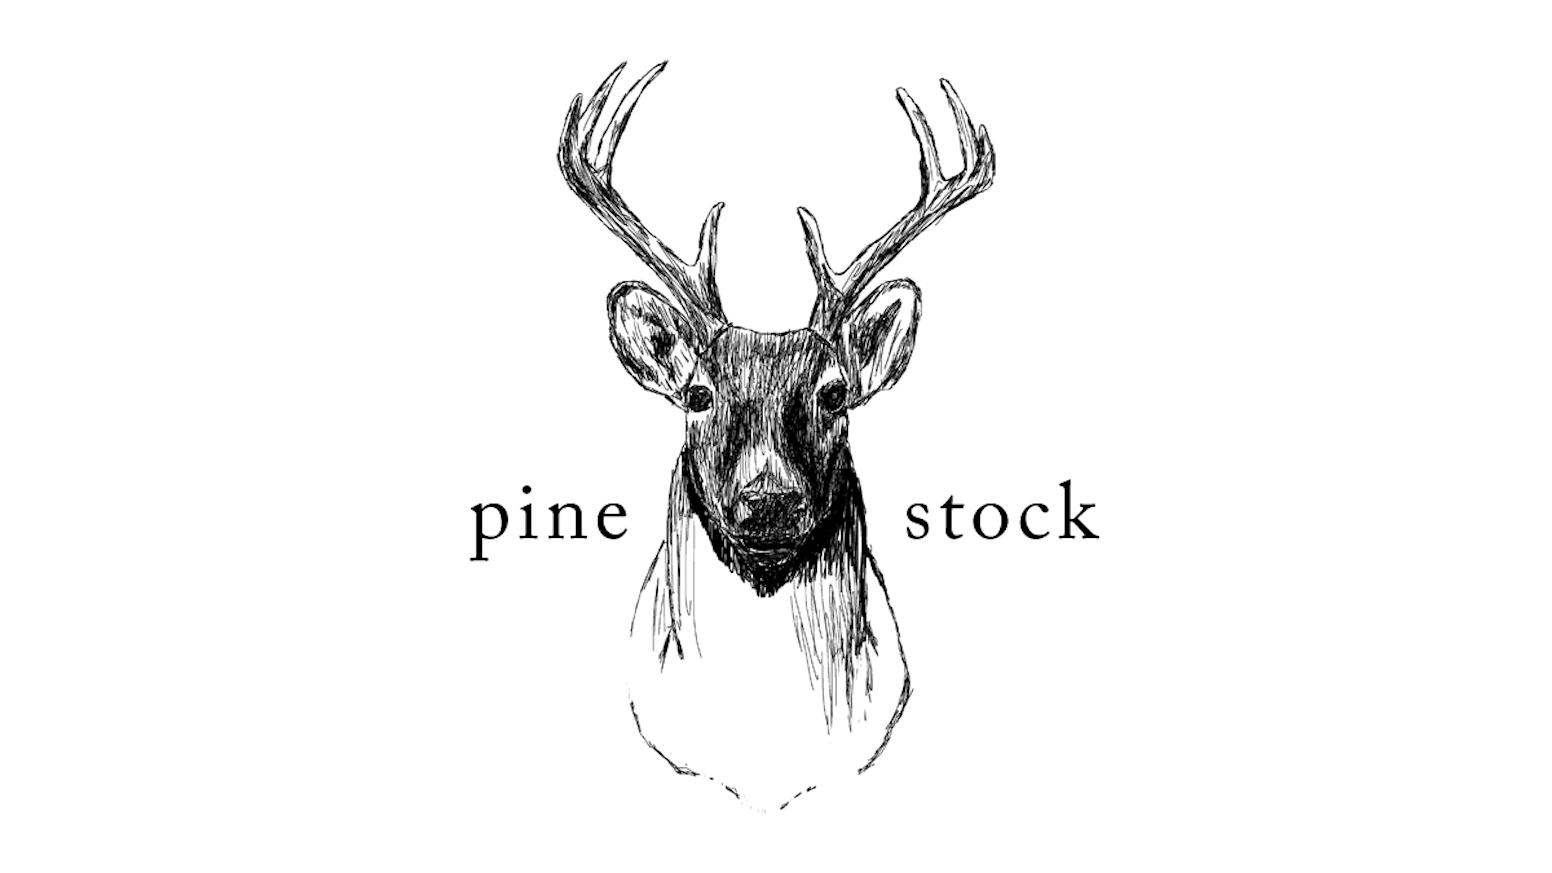 Pine-Stock by Matthew Kent — Kickstarter